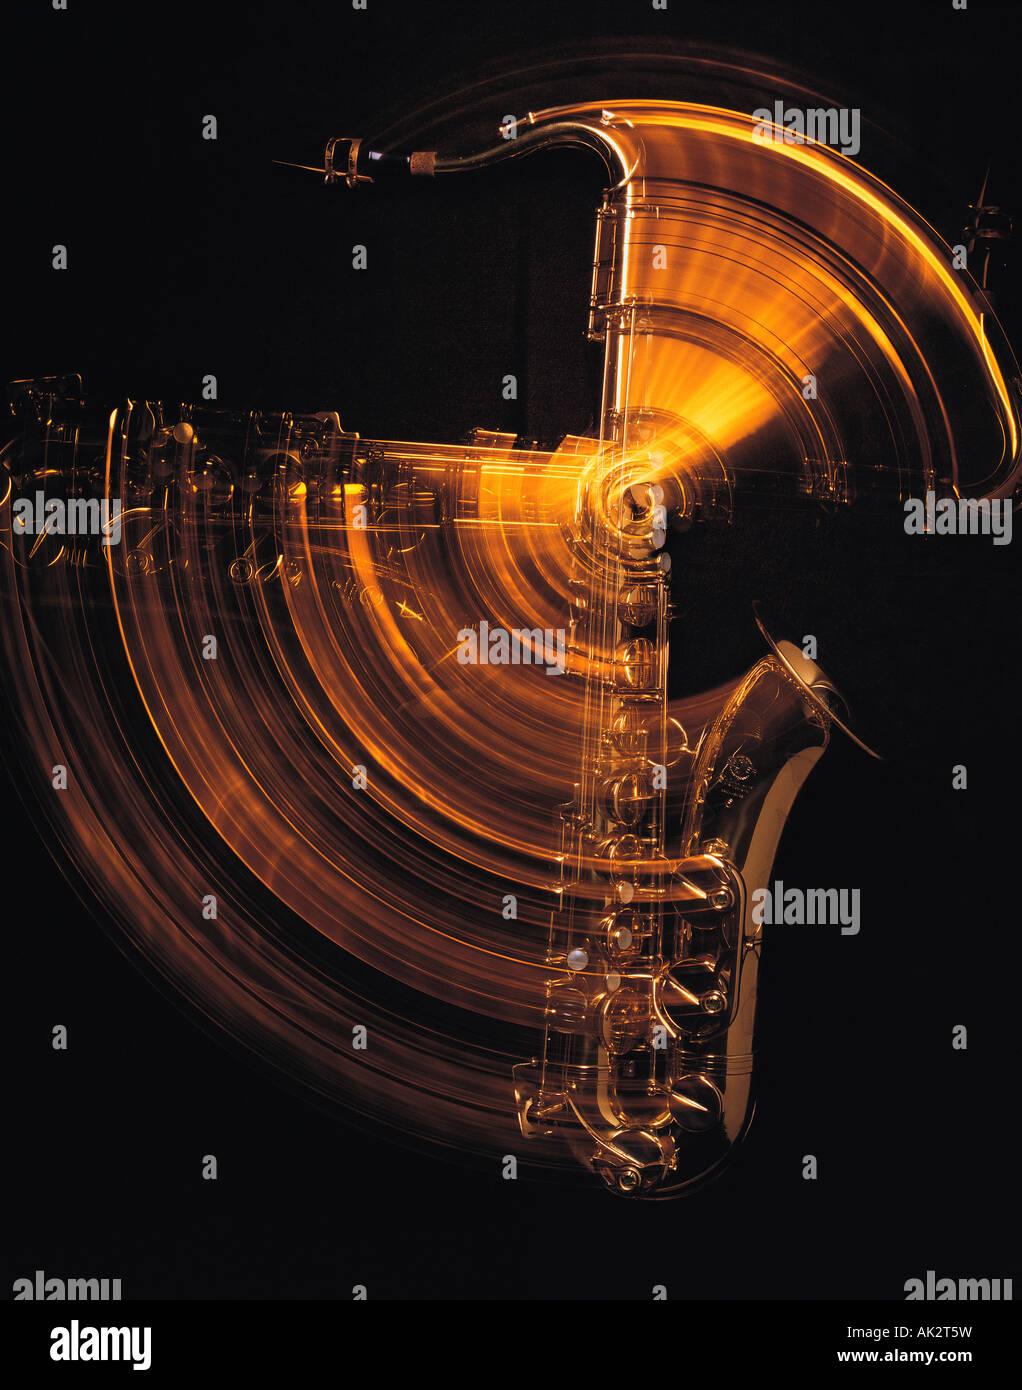 Still life. Musical instrument. Saxophone. - Stock Image